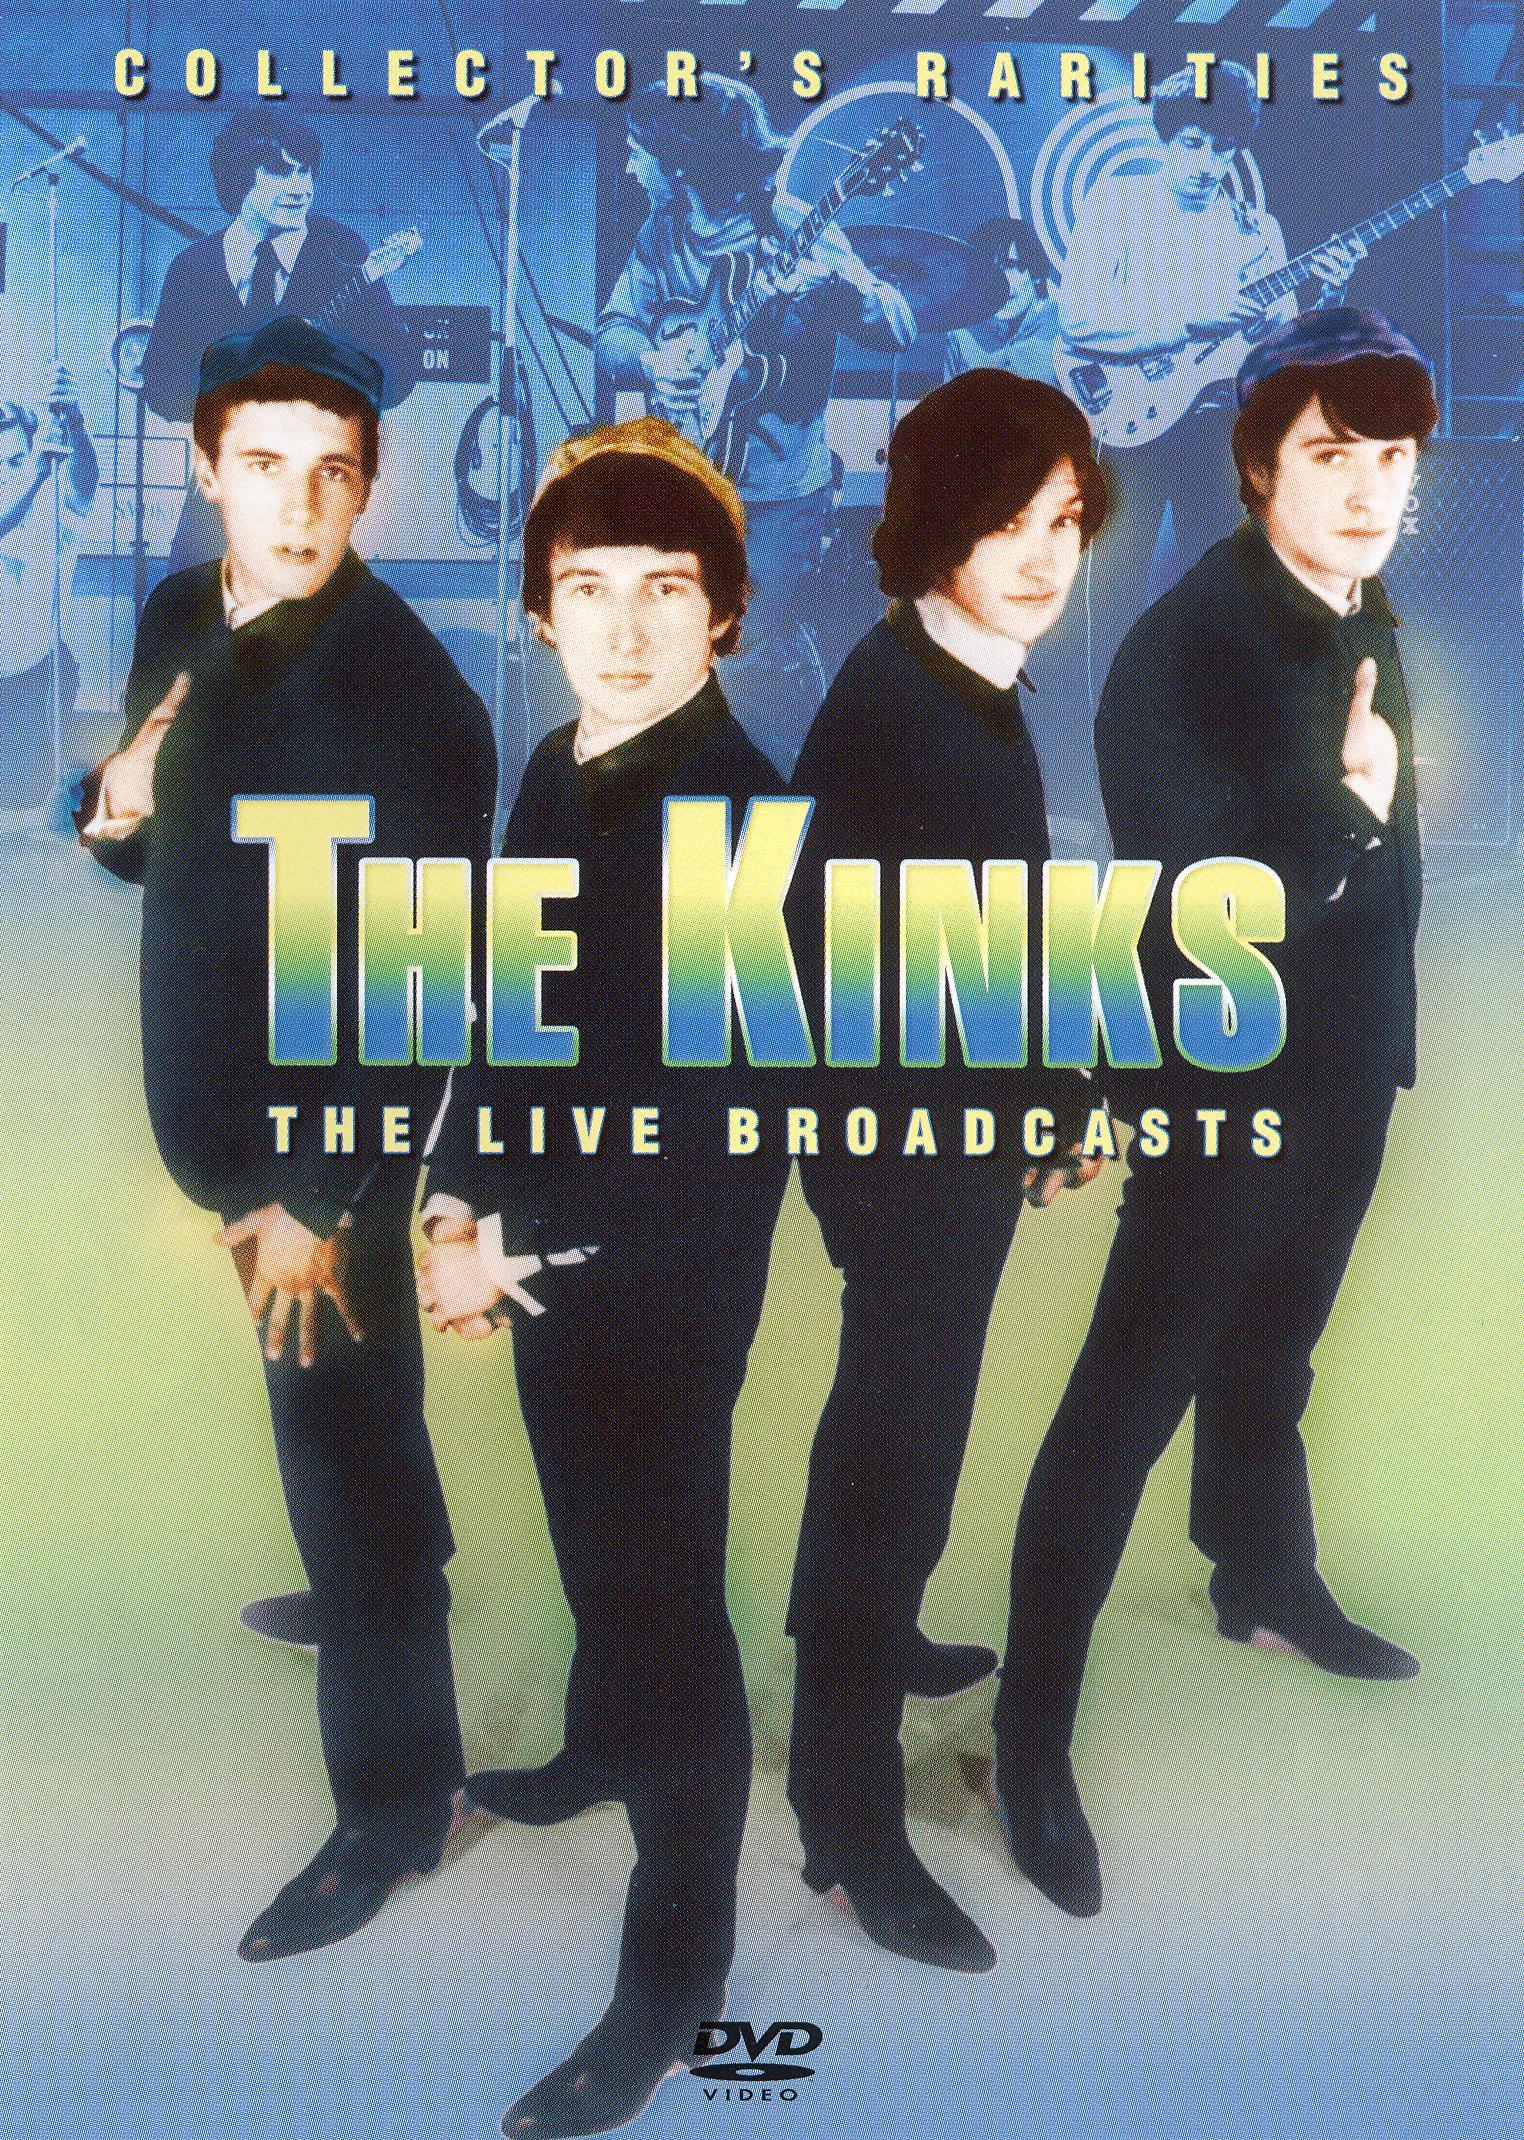 The Kinks: Live Broadcasts - Collector's Rarities